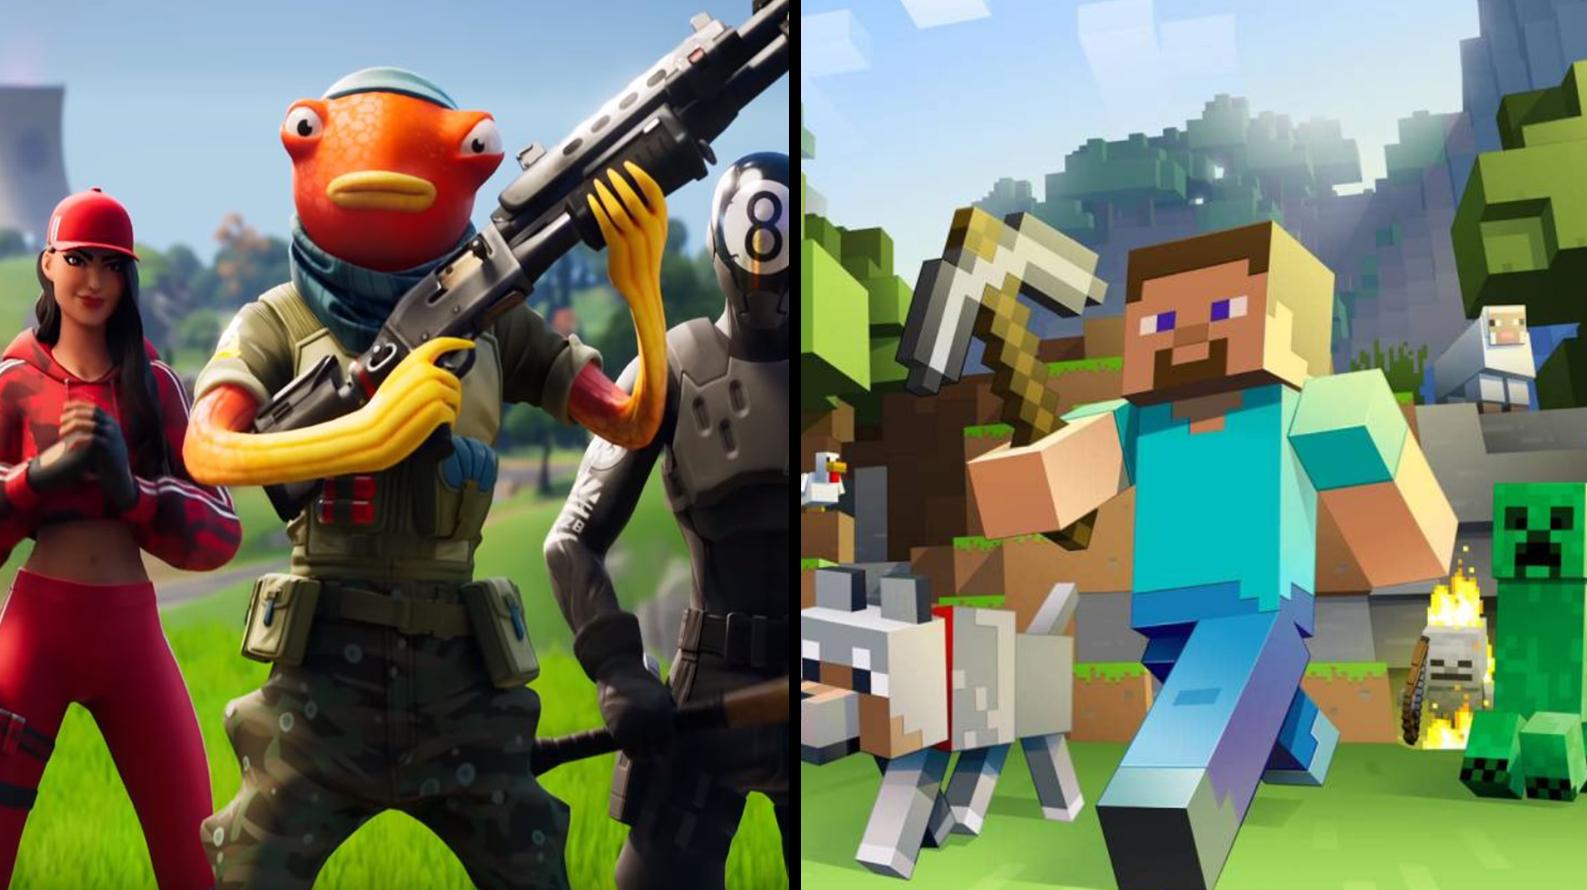 Epic Games - Fortnite / Mojang - Minecraft